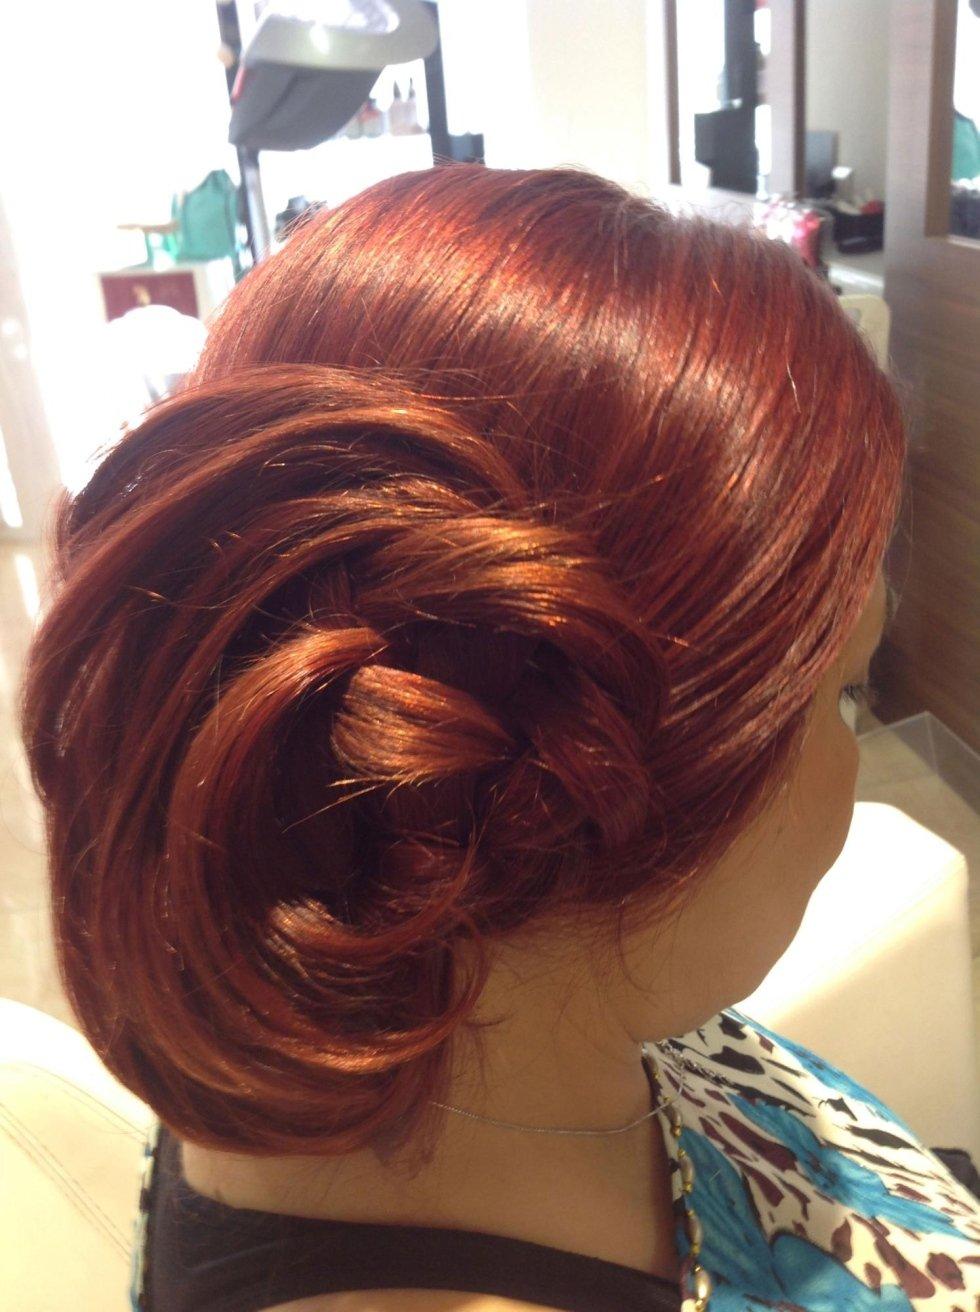 acconciatura capelli